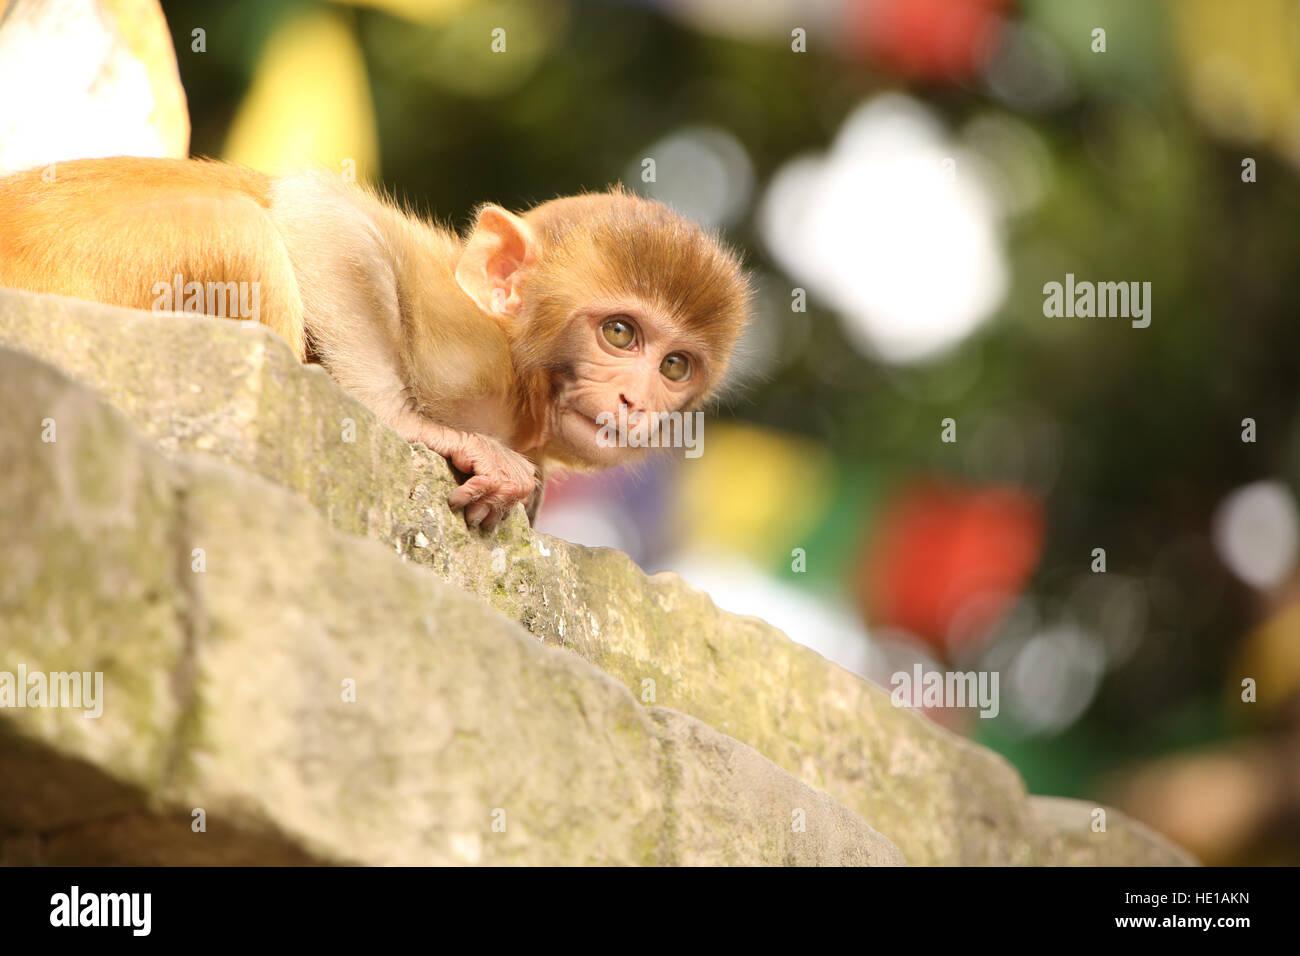 Monkey peeks over the edge at the Monkey temple, Swayambhu Nath temple, Kathmandu, Nepal. - Stock Image